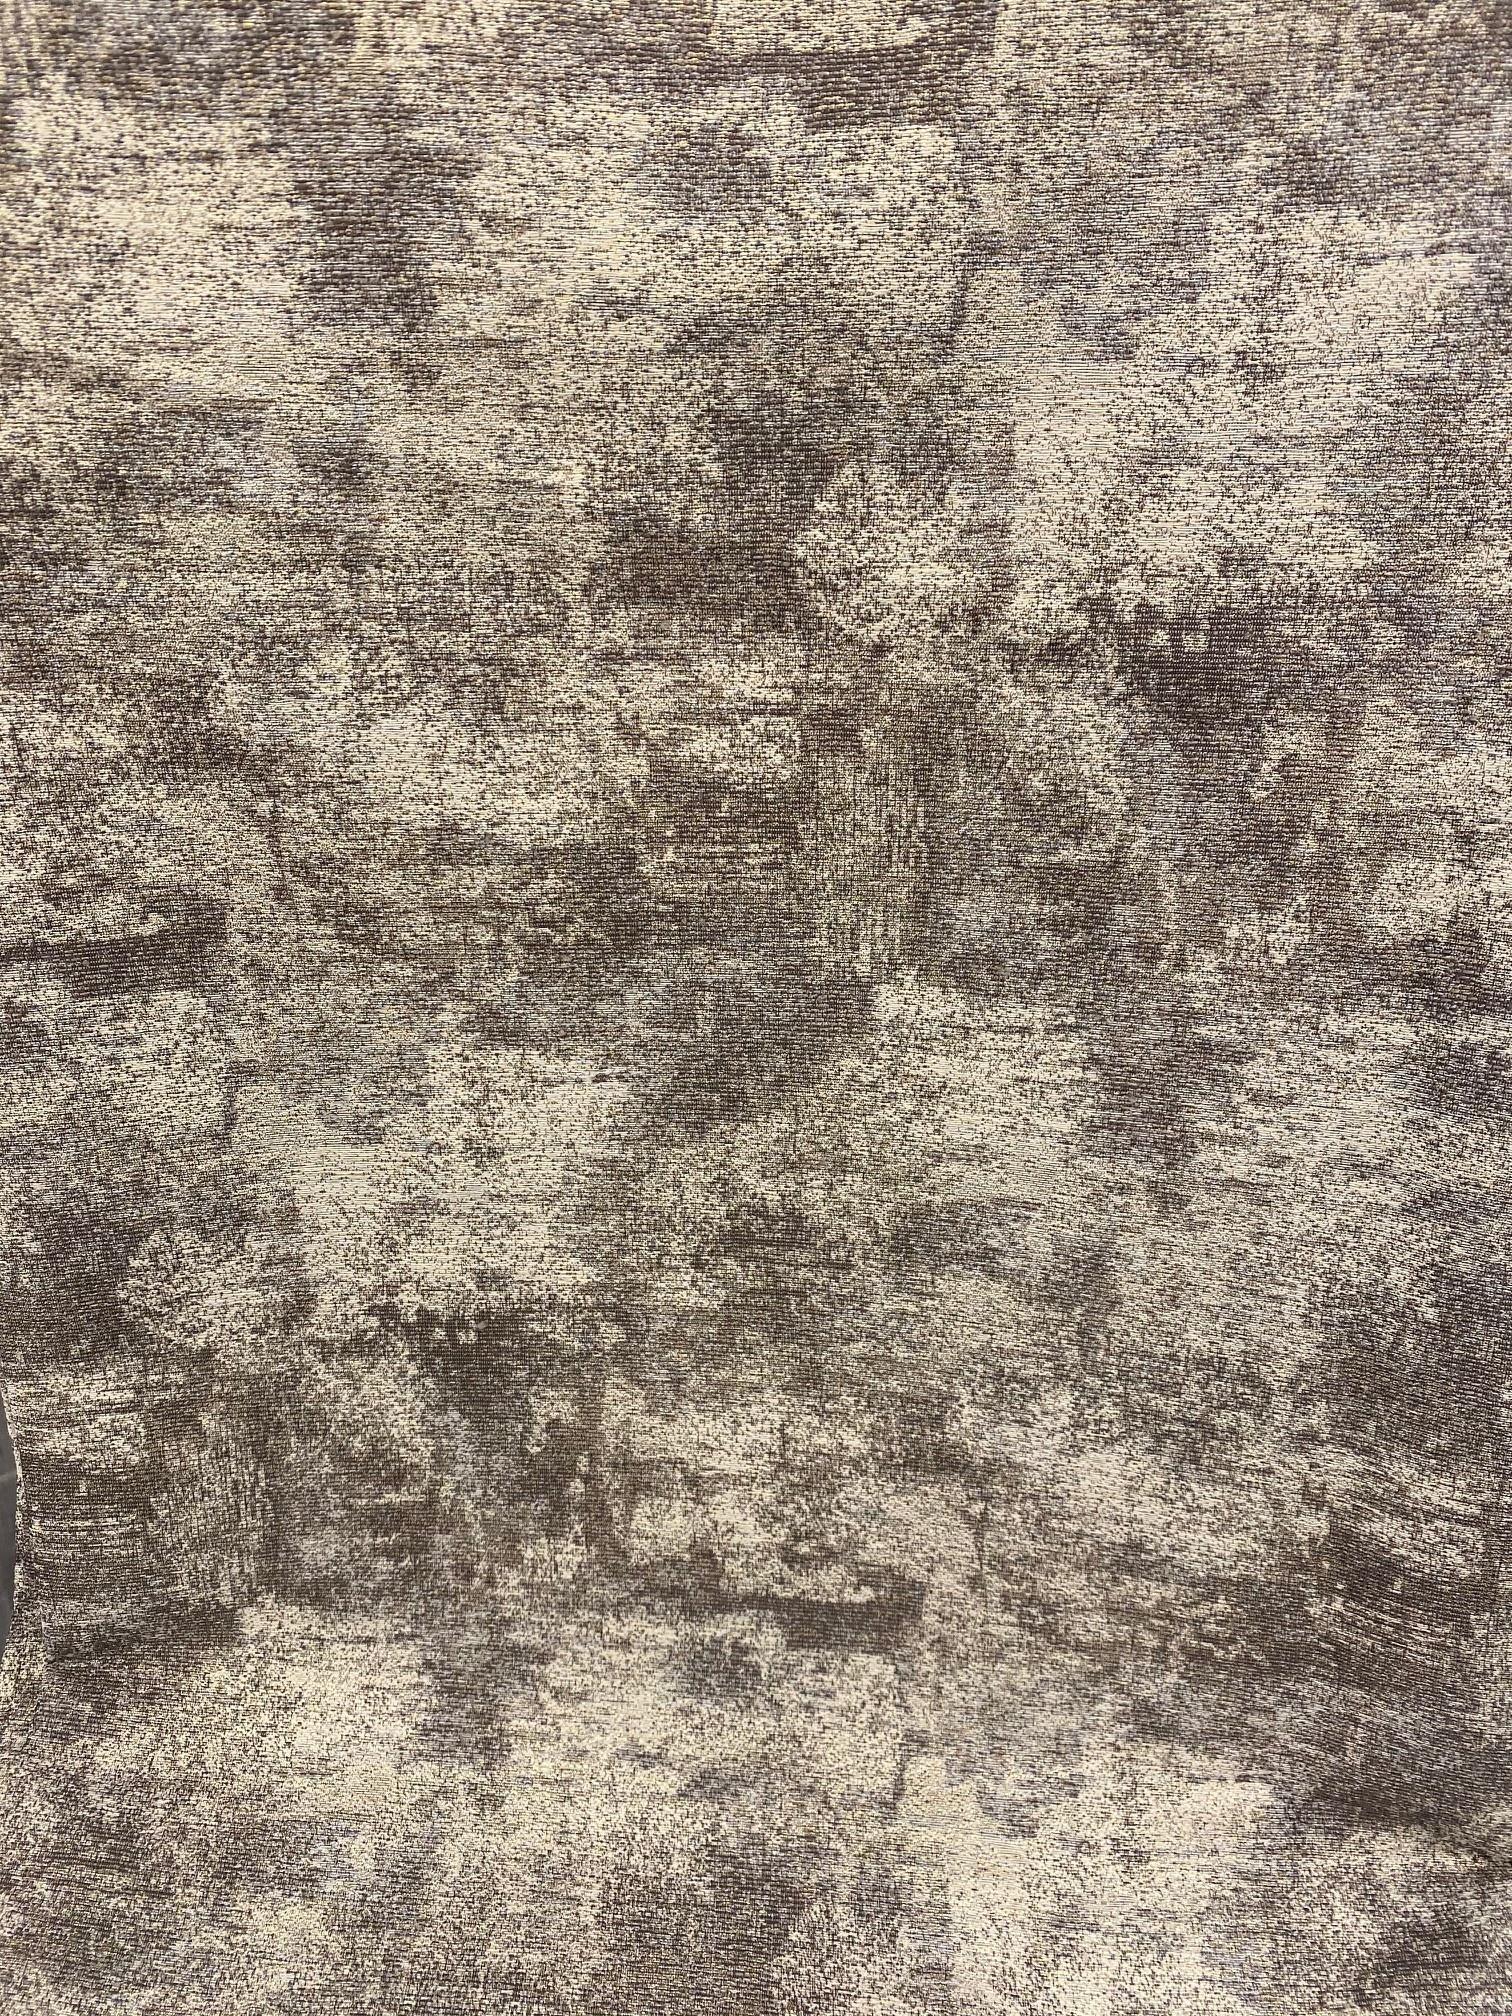 Jacquard Ivory/Grey/Gold TC1301 70 x 120 Tablecloth